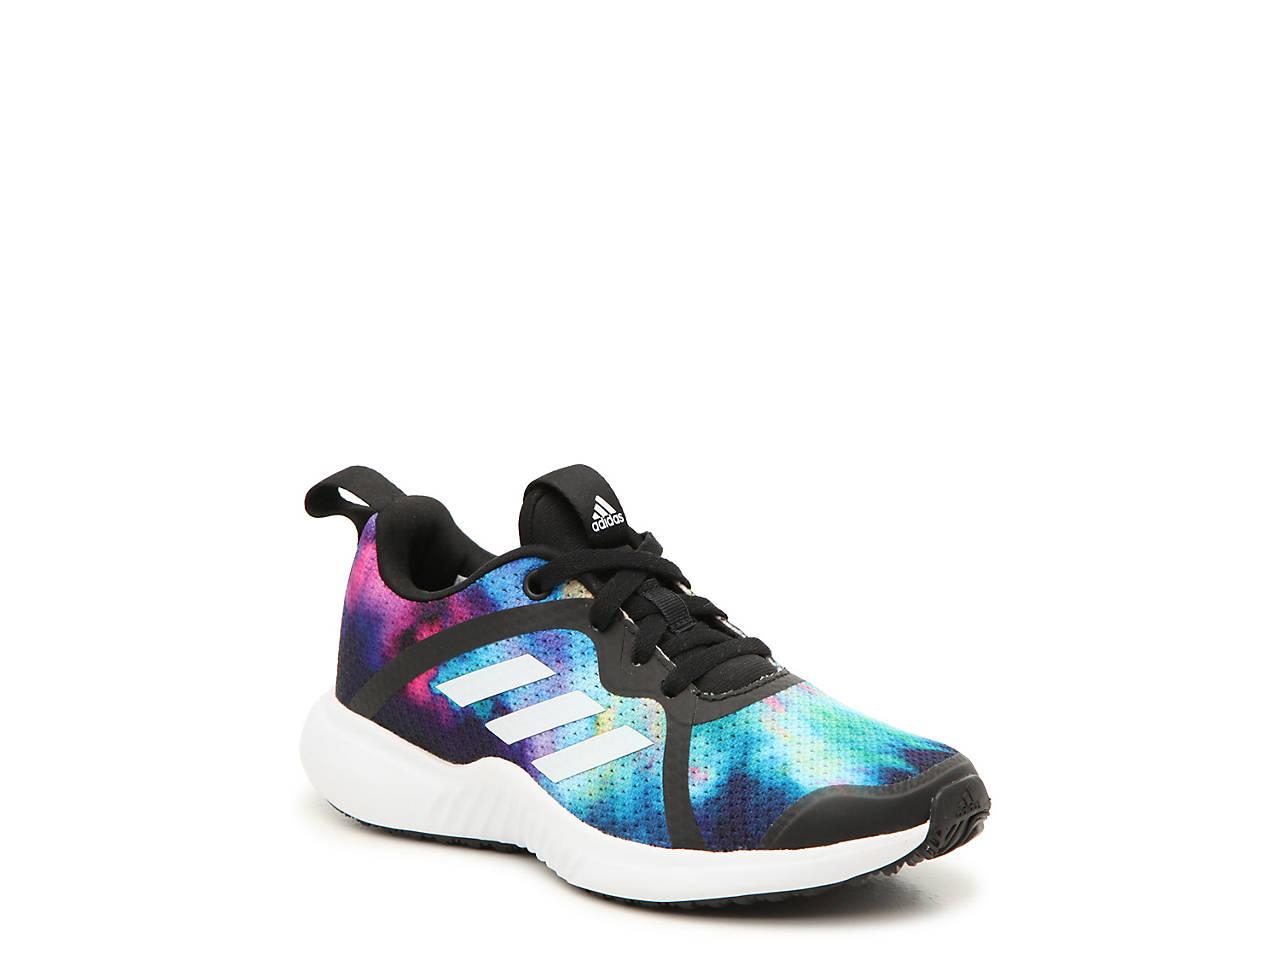 size 40 987f0 8e560 adidas. Fortarun X Toddler  Youth Running Shoe